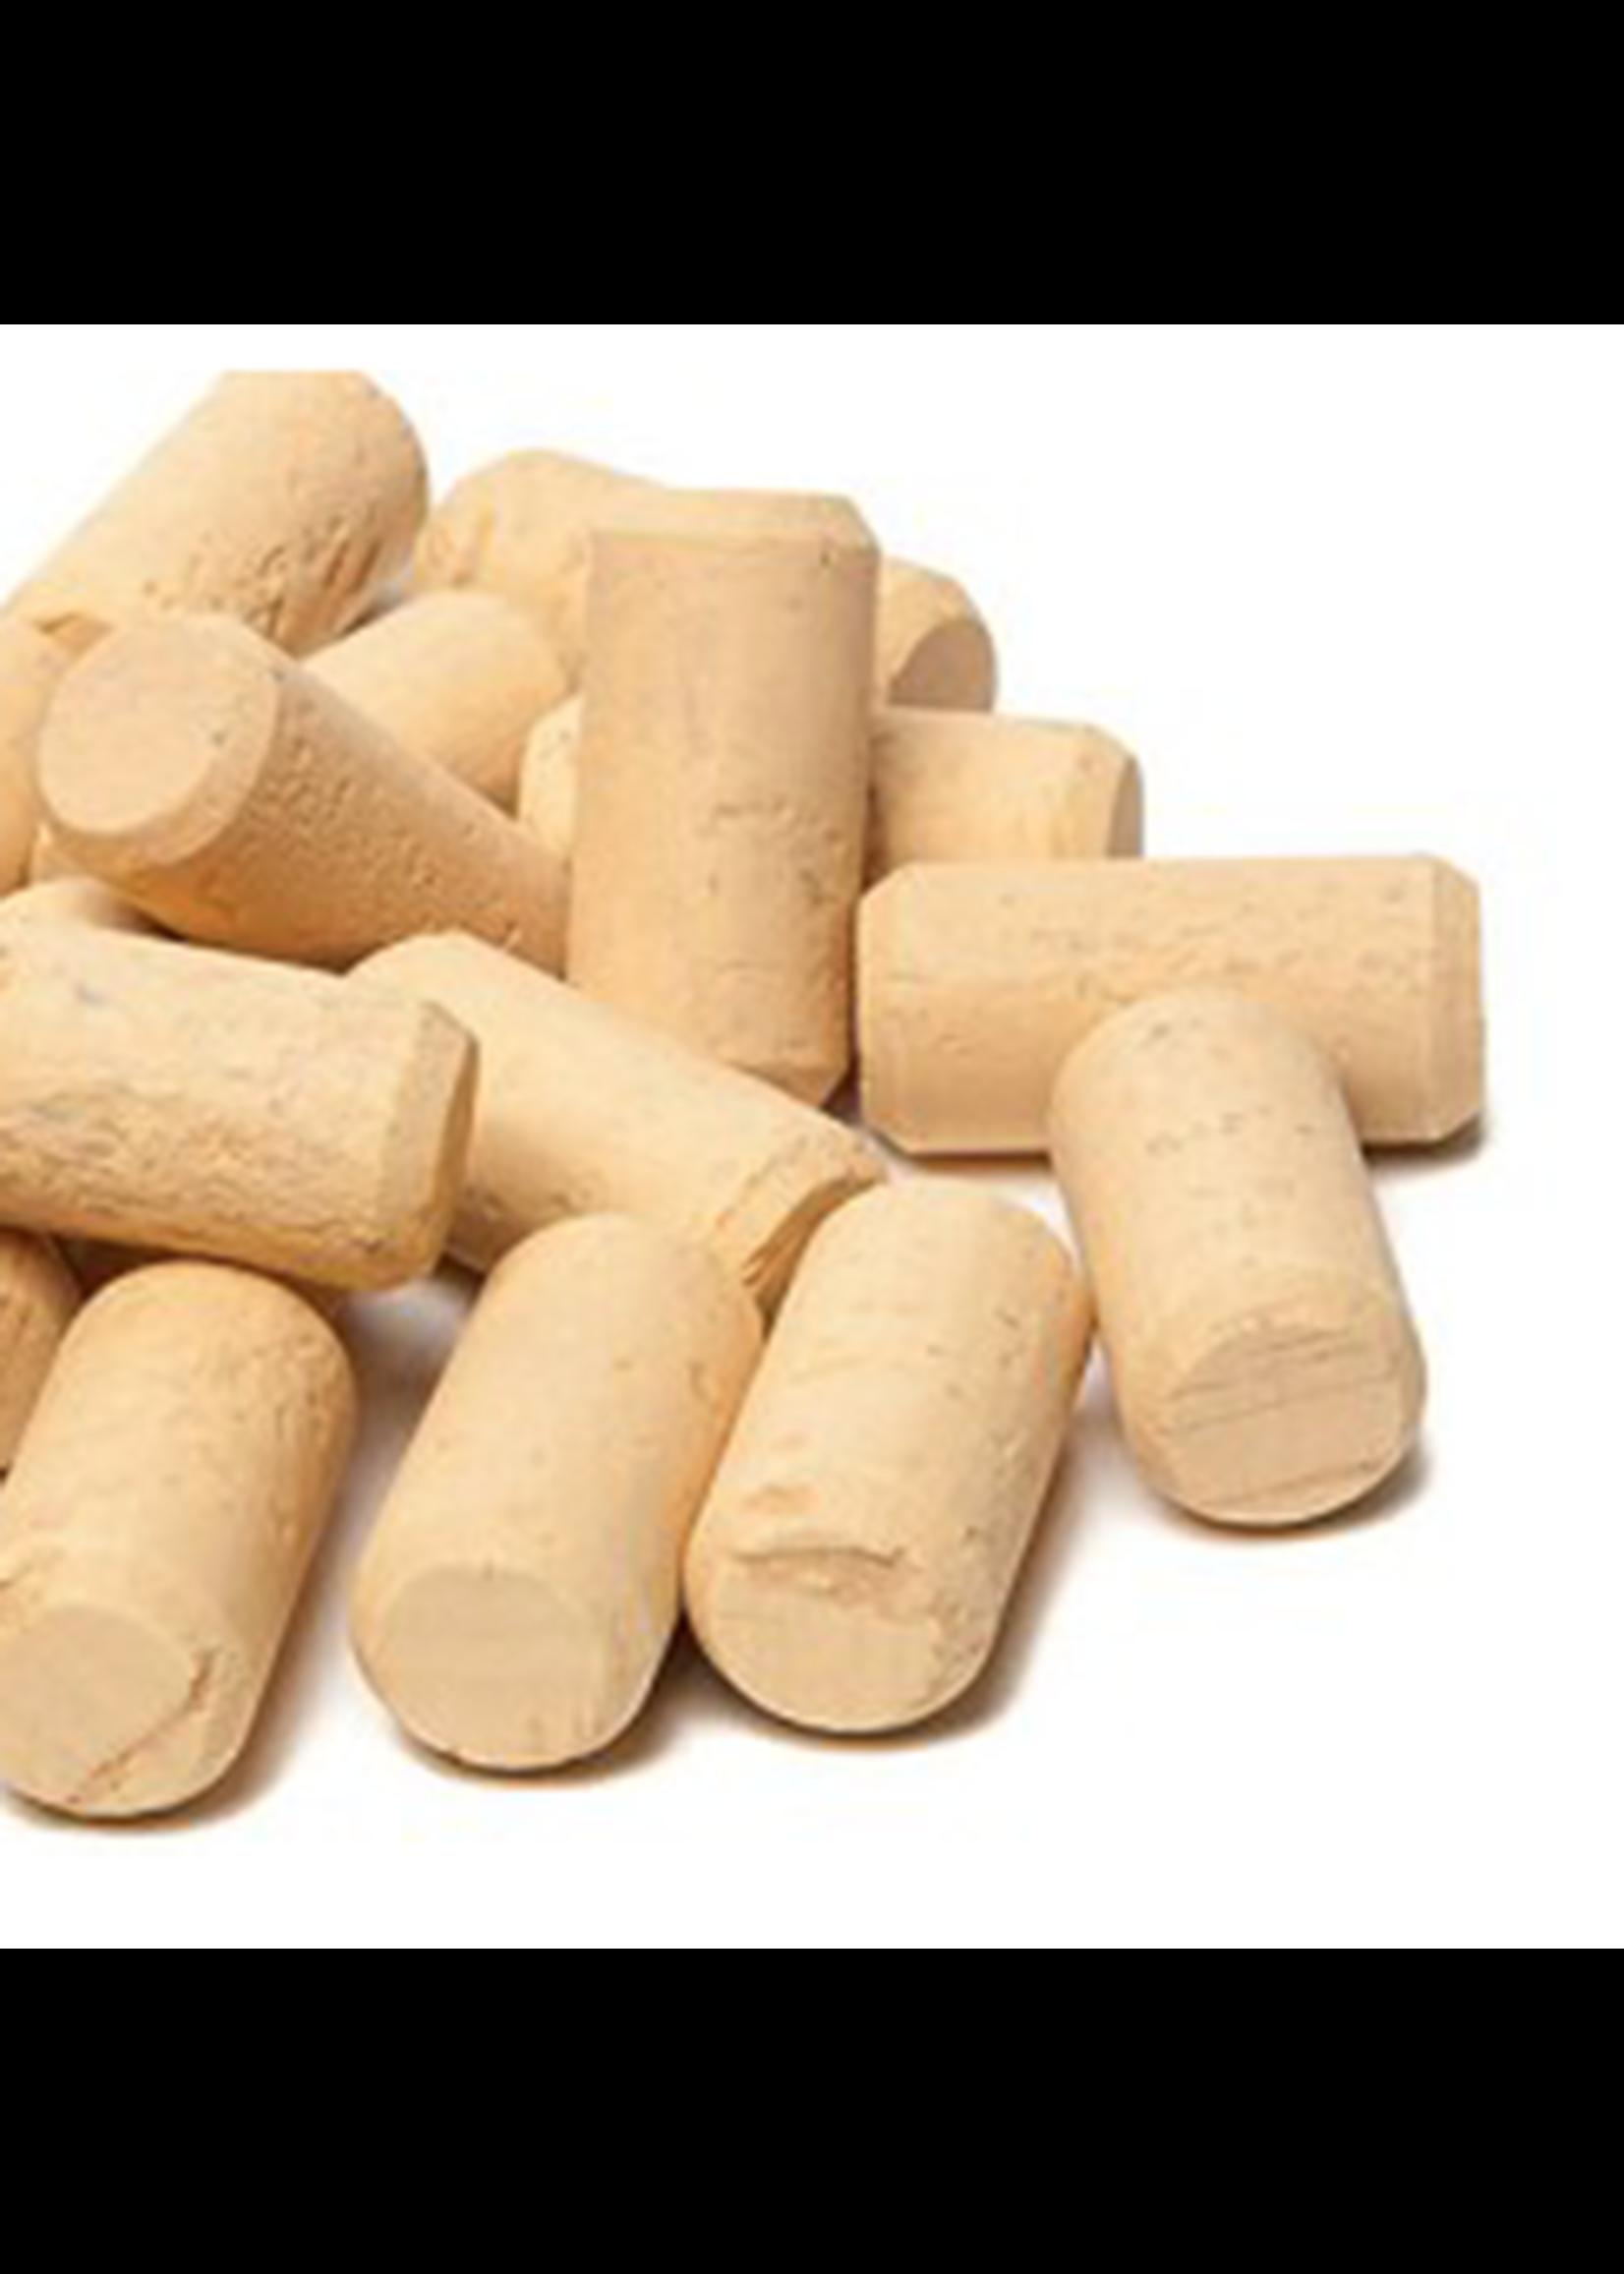 "Racking/Bottling Corks, Wine - #7 x 1 3/4"" First Quality (30/bag)"